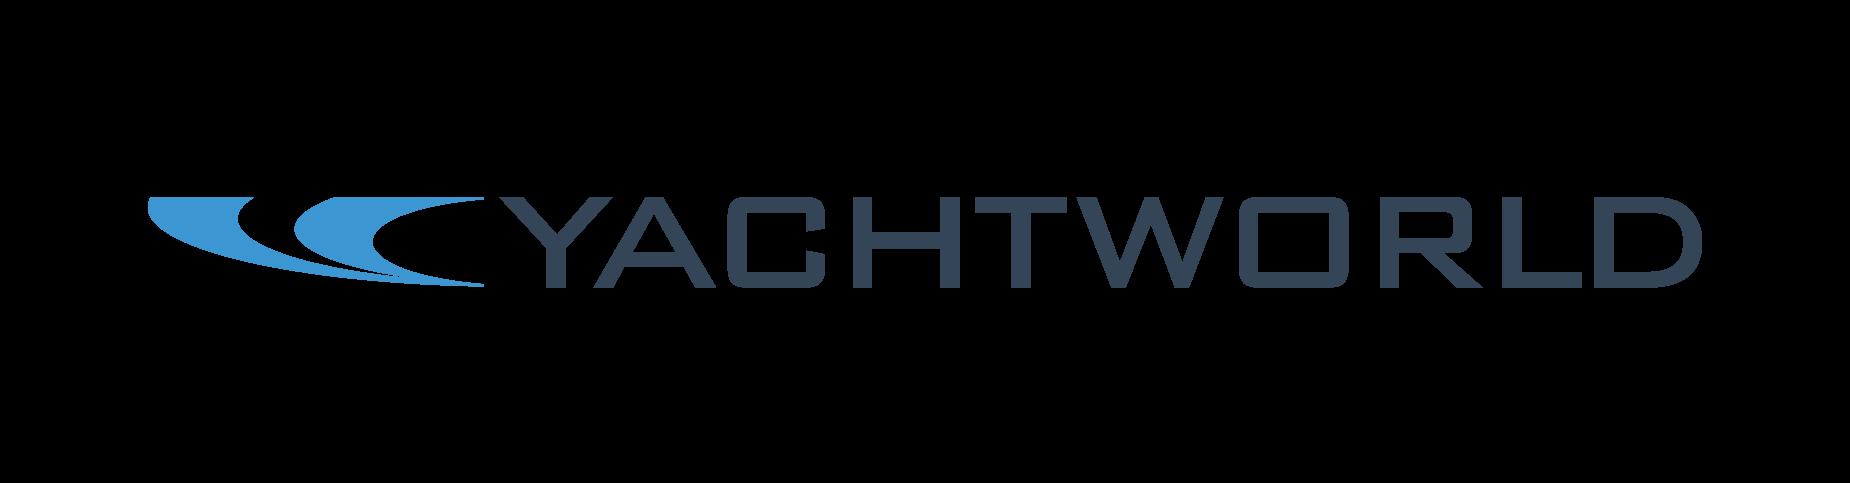 Yacht World advertising logo